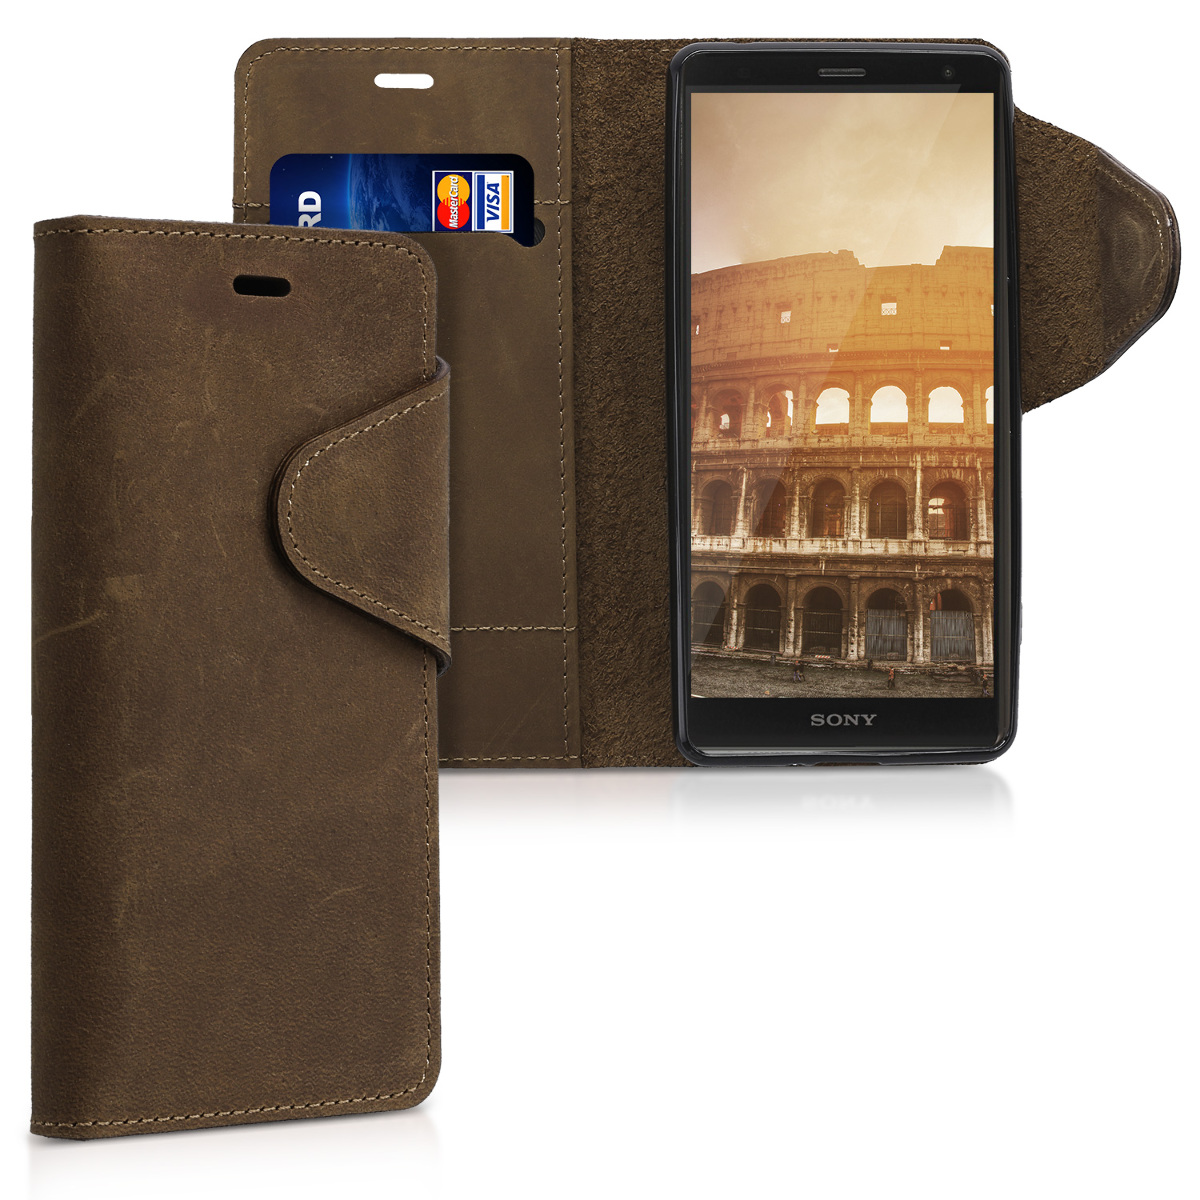 Kalibri Δερμάτινη Suede Θήκη - Πορτοφόλι Sony Xperia XZ2 -  Brown (44306.05)